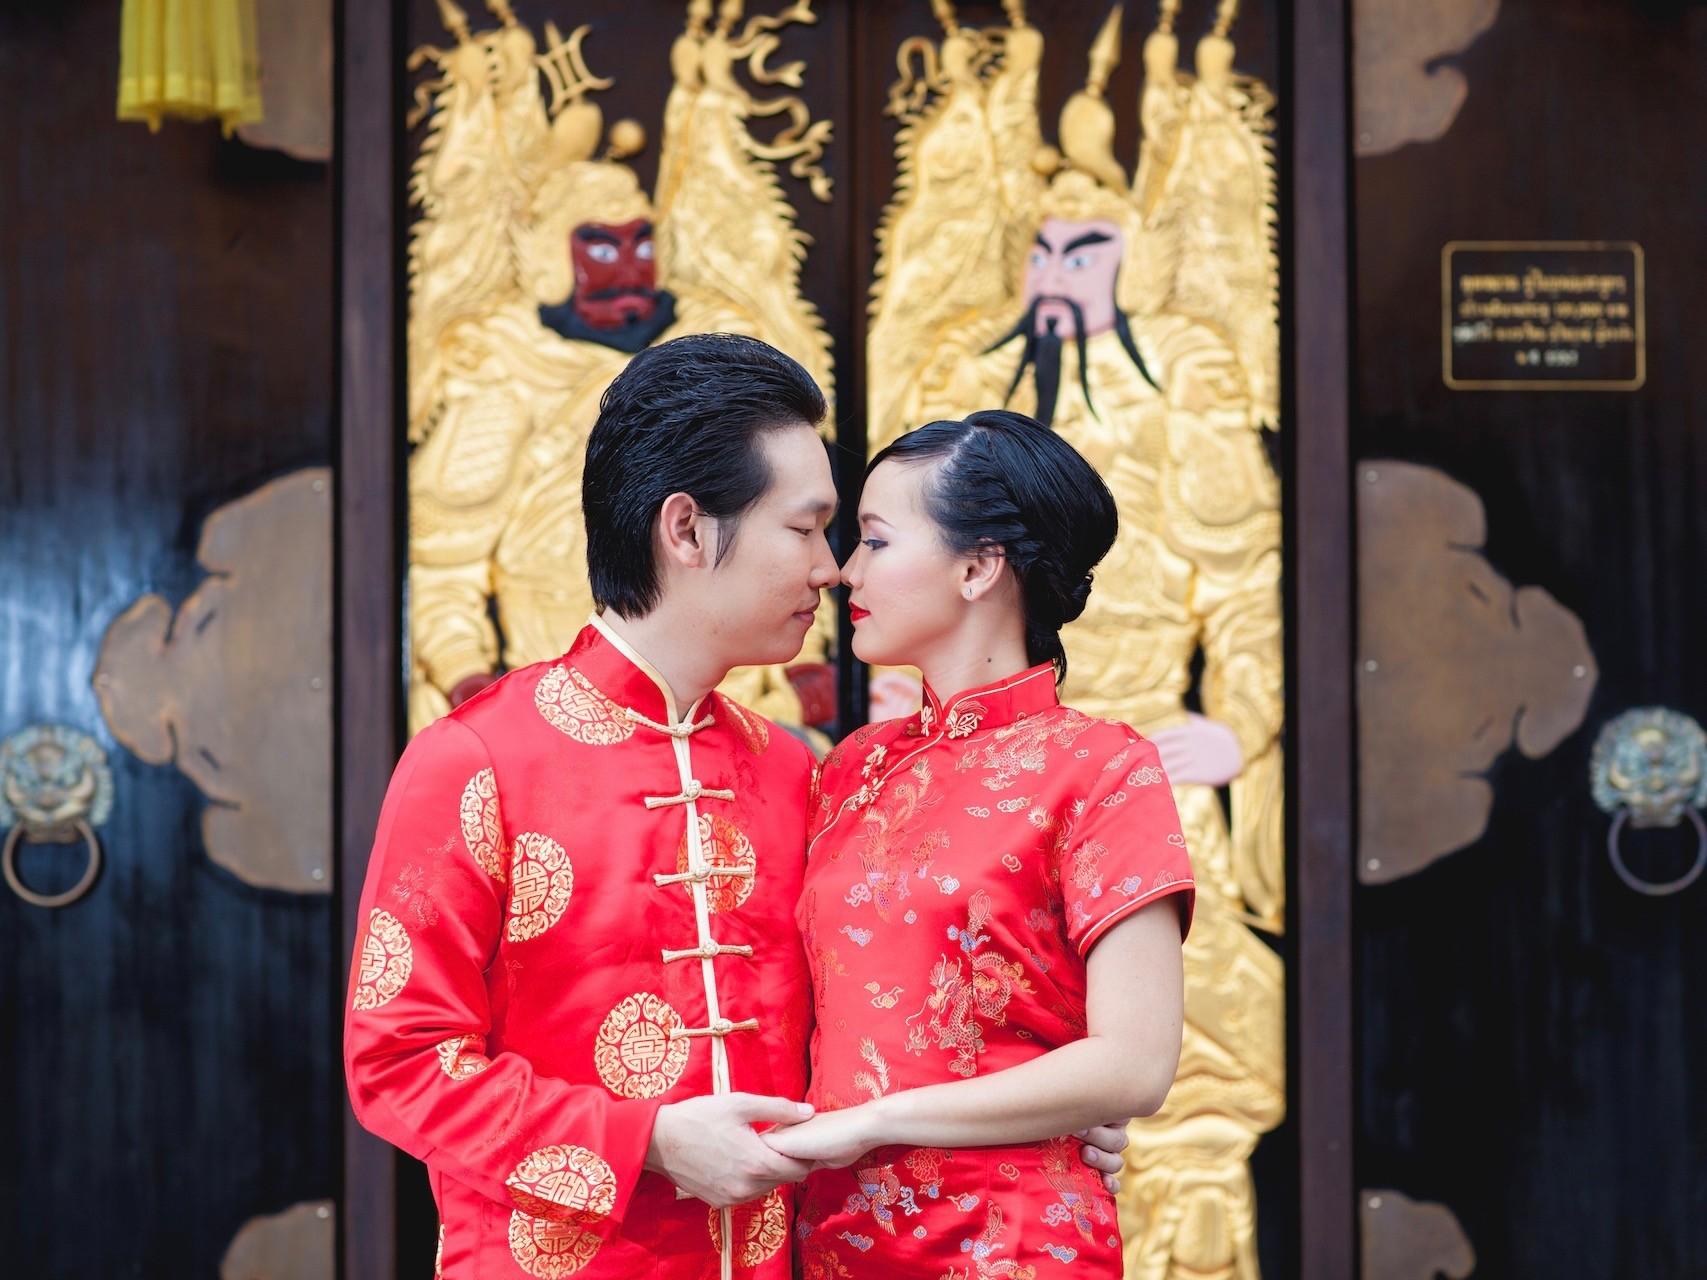 Hochzeitsrituale in China